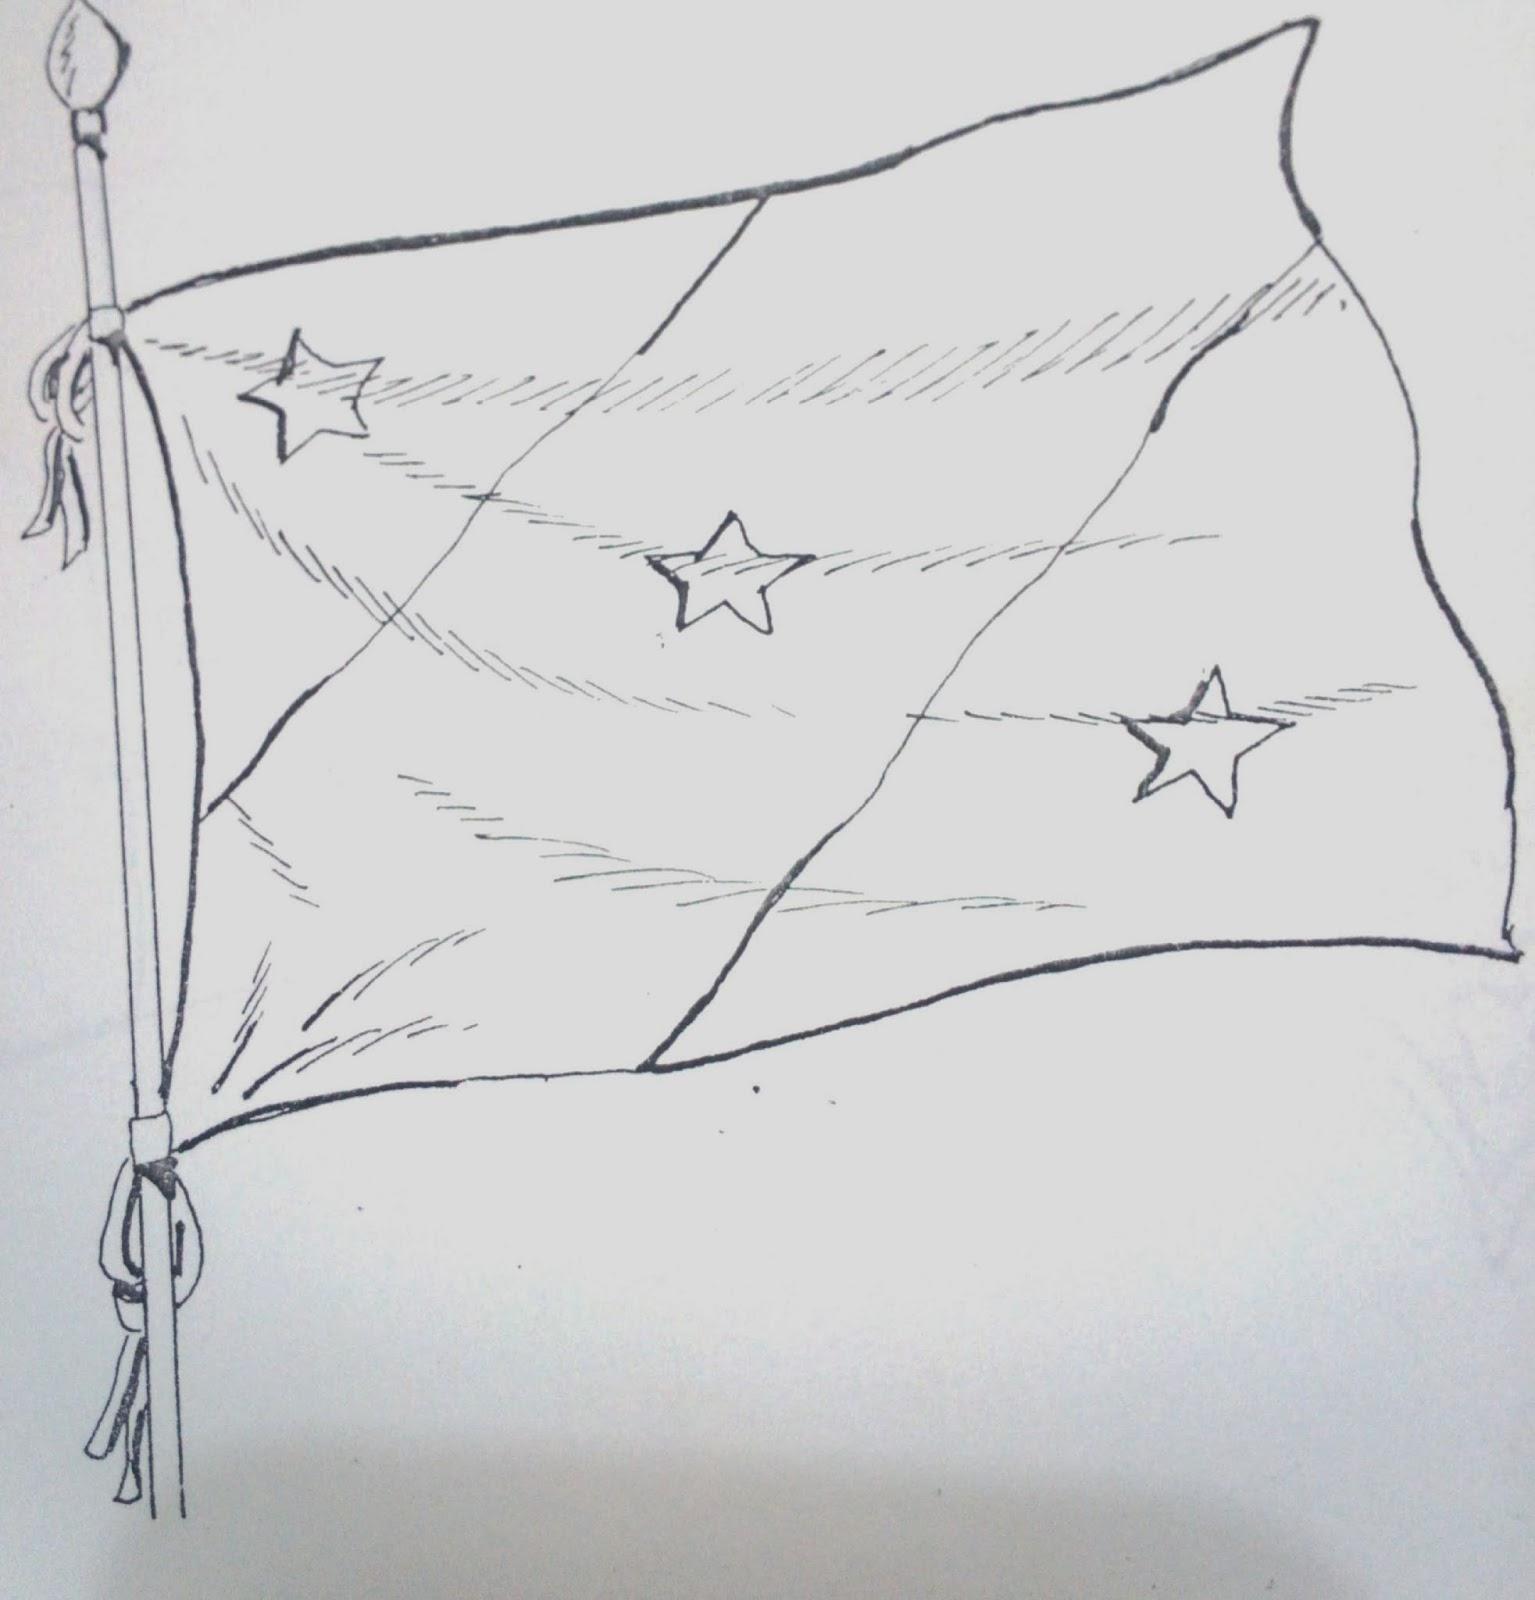 Único Colorear Bandera De México Motivo - Dibujos Para Colorear En ...